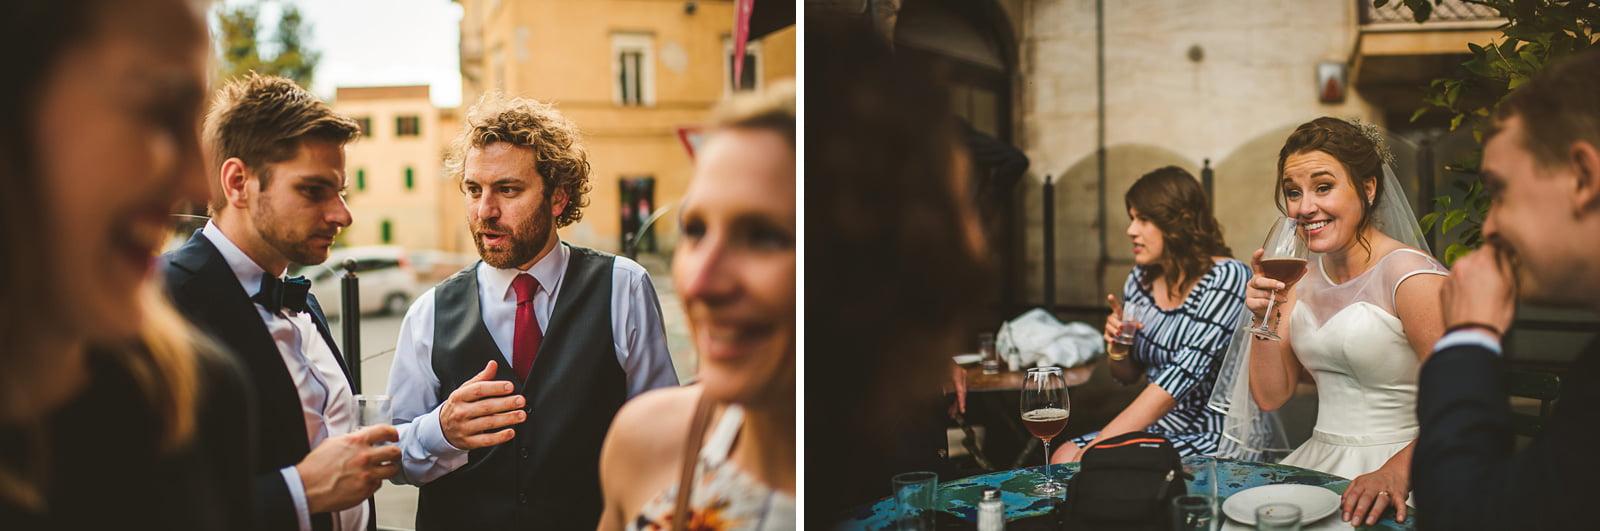 Wedding at Siena, A+L Wedding At Siena Town Hall – By Federico Pannacci Wedding Photographer, Federico Pannacci, Federico Pannacci